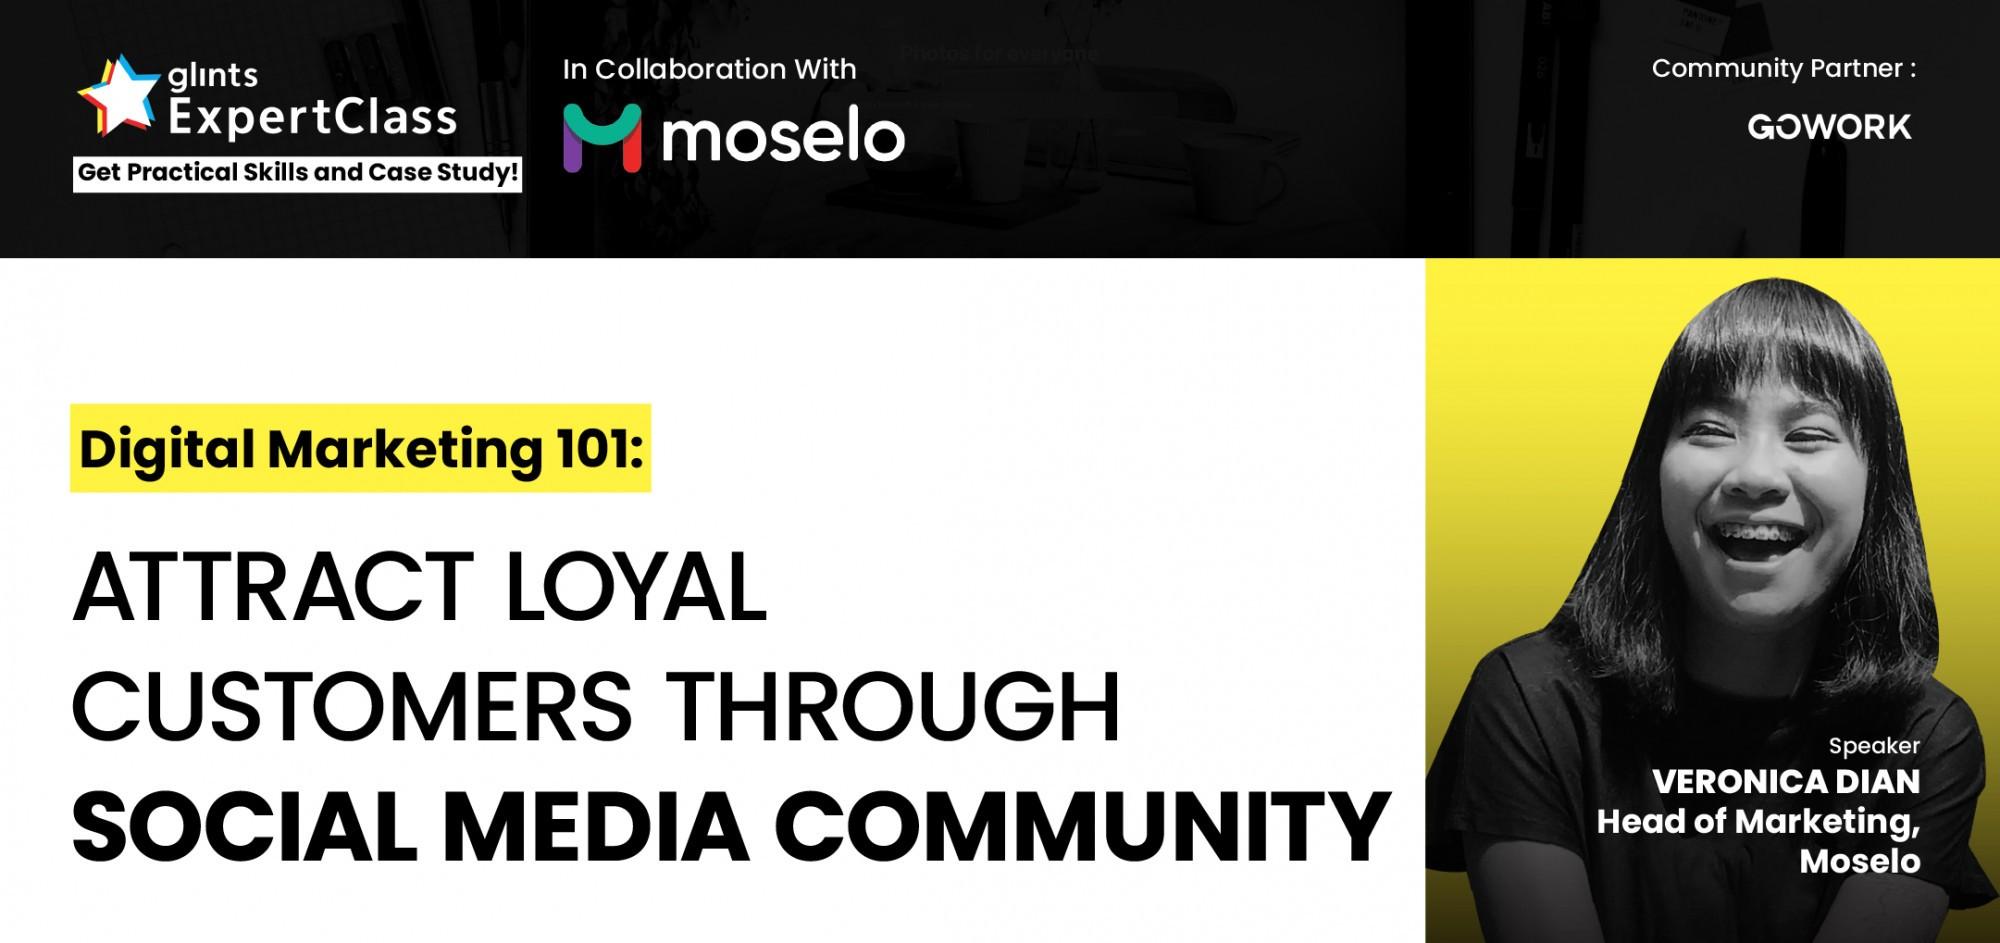 [Online Glints ExpertClass] Glints x Moselo: Attract Loyal Customers through Social Media Community